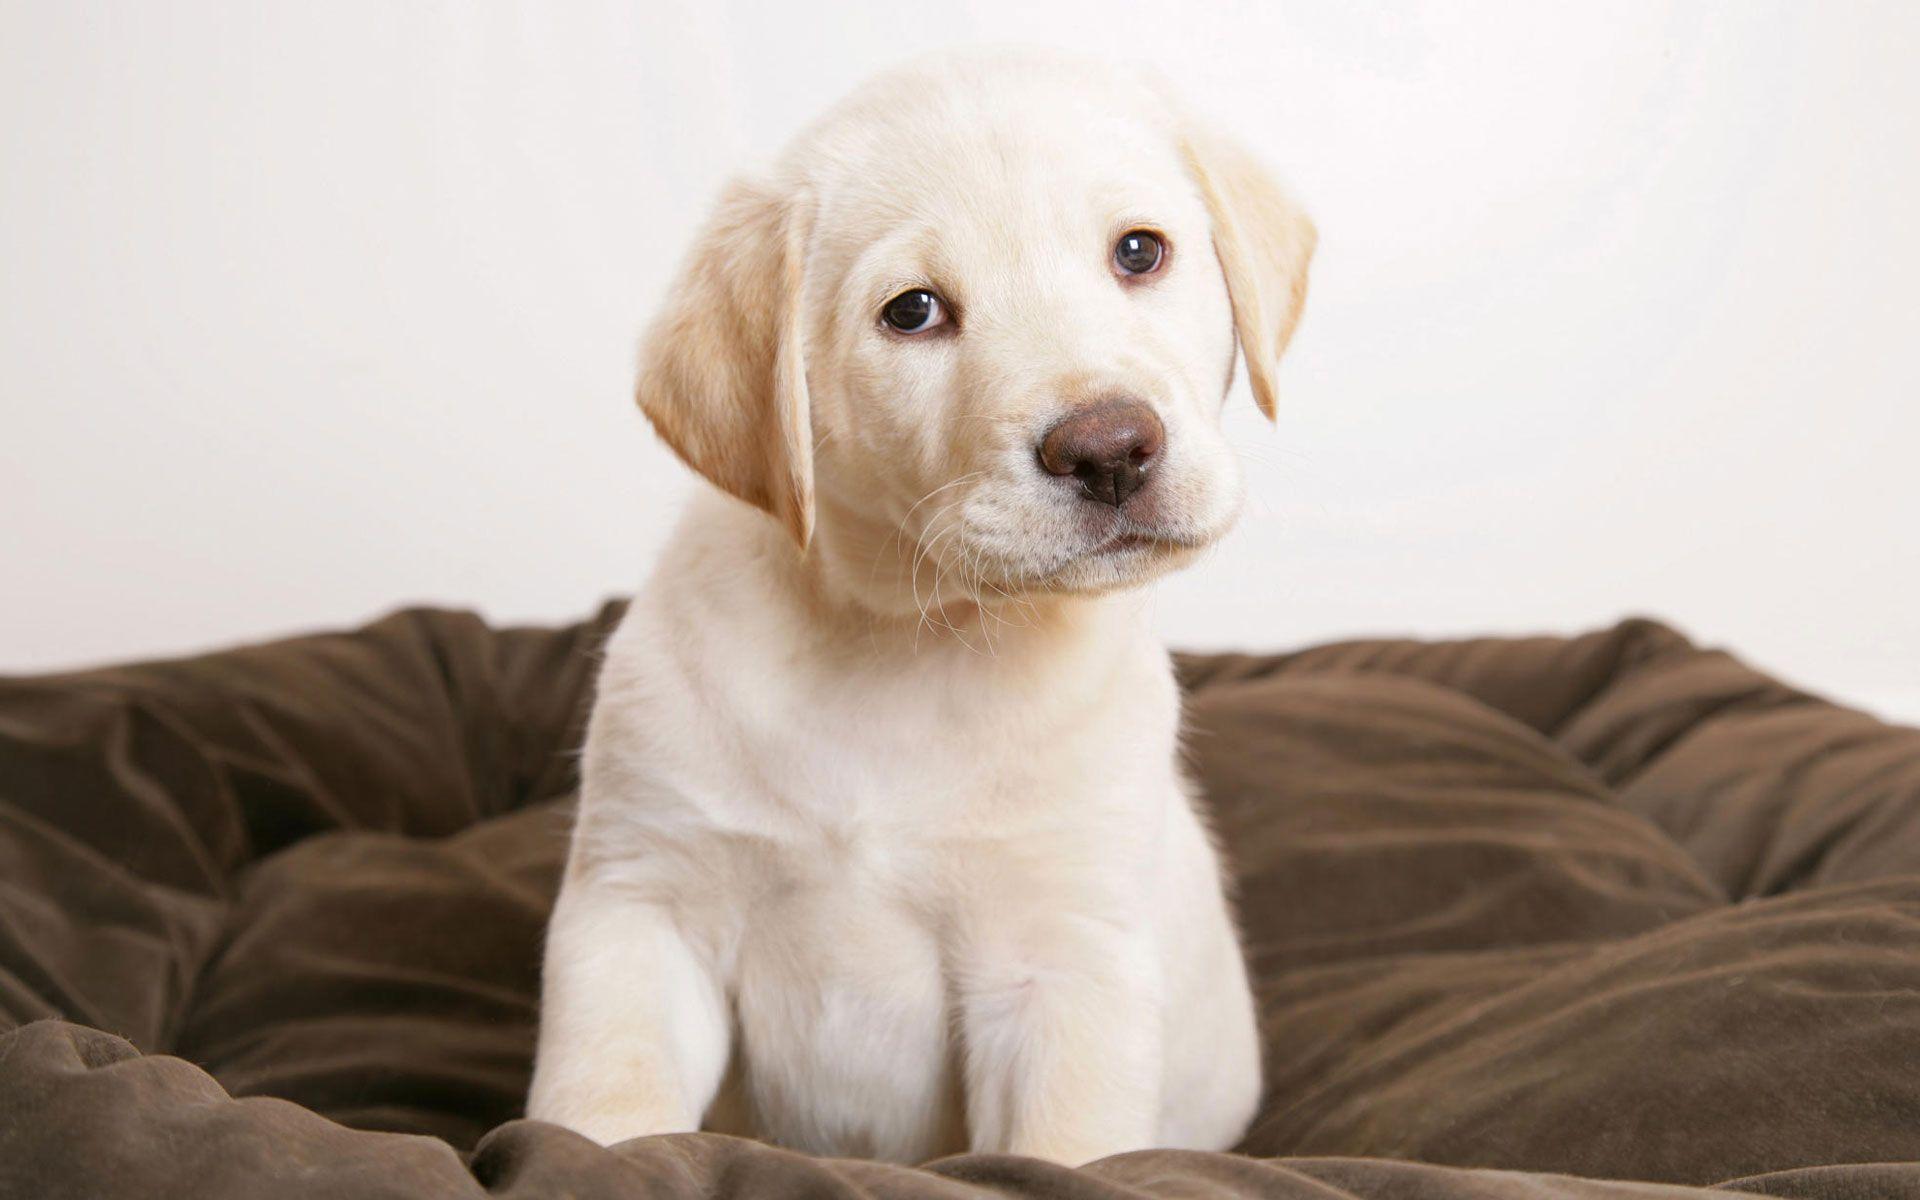 Cute Puppy Wallpaper Cute Puppy Wallpaper Puppy Wallpaper Labrador Retriever Puppies